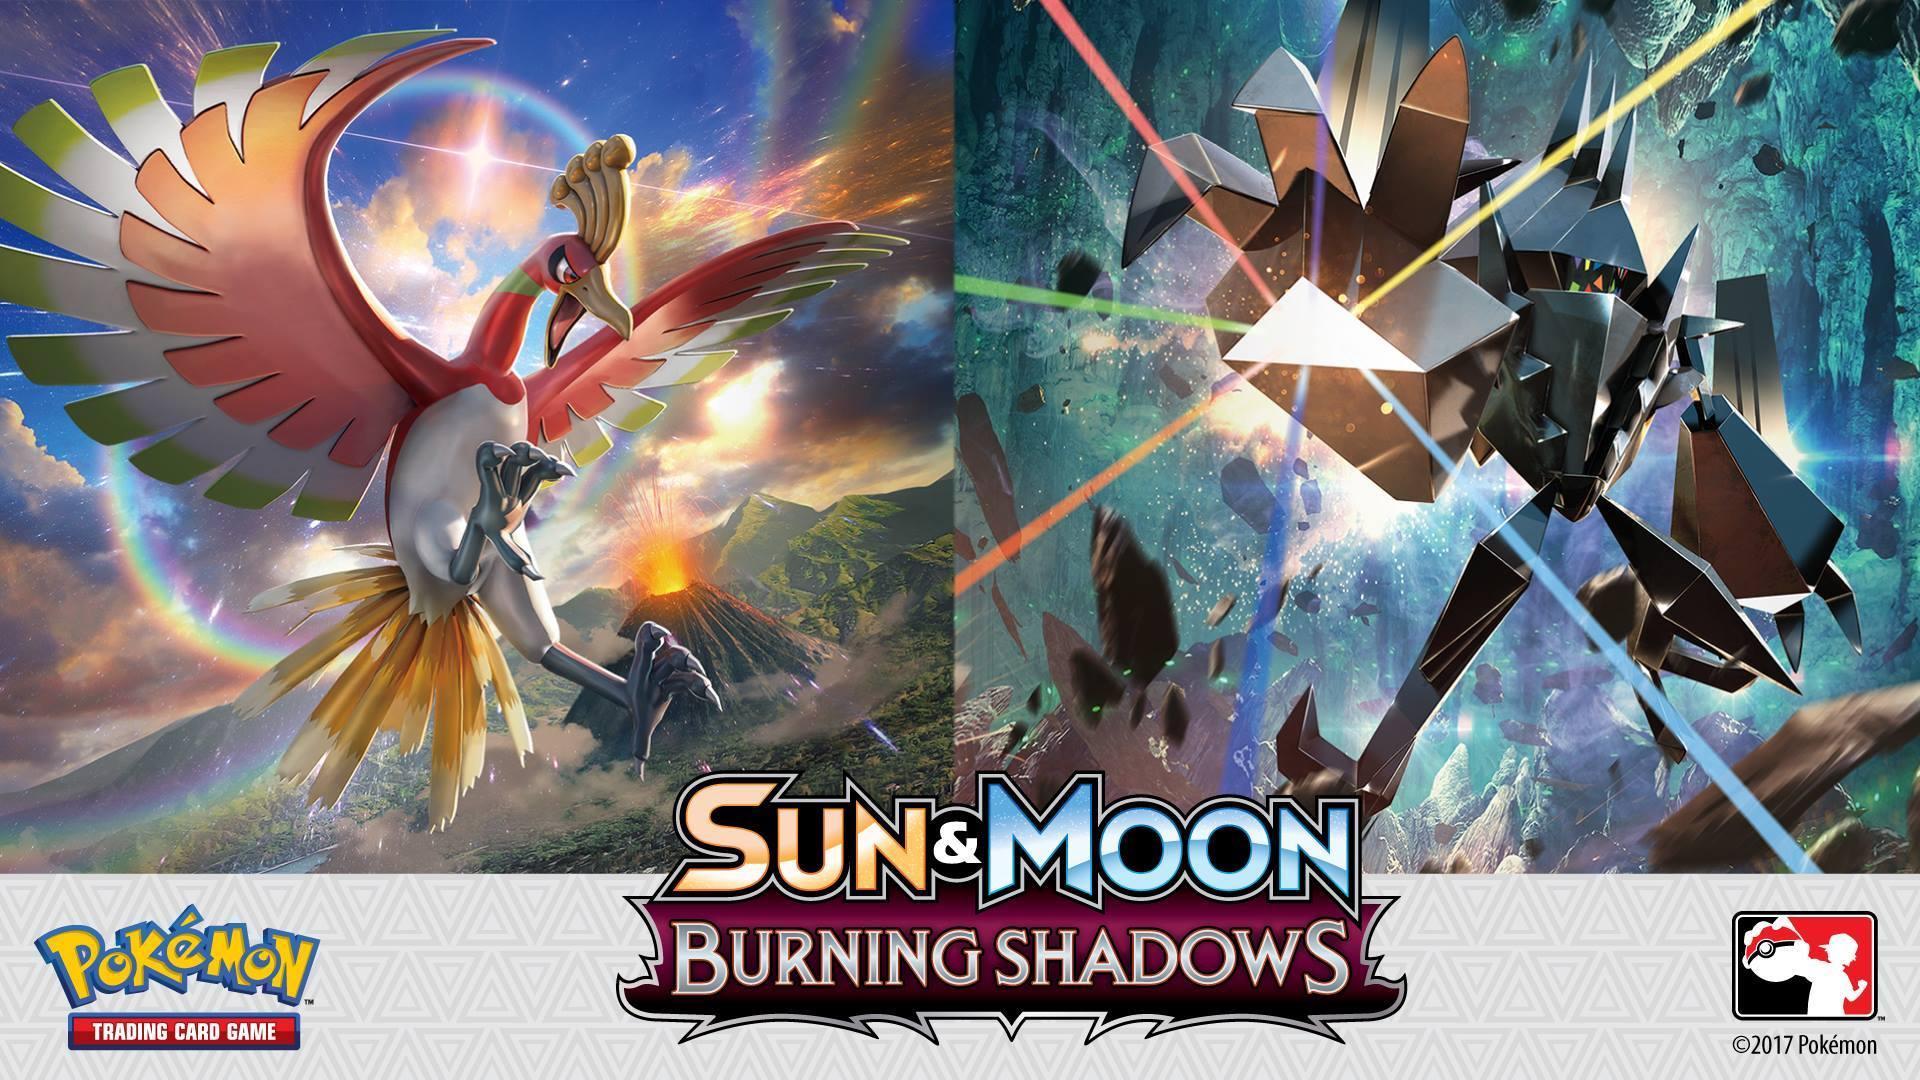 Midnight Sun & Moon—Burning Shadows Prereleas